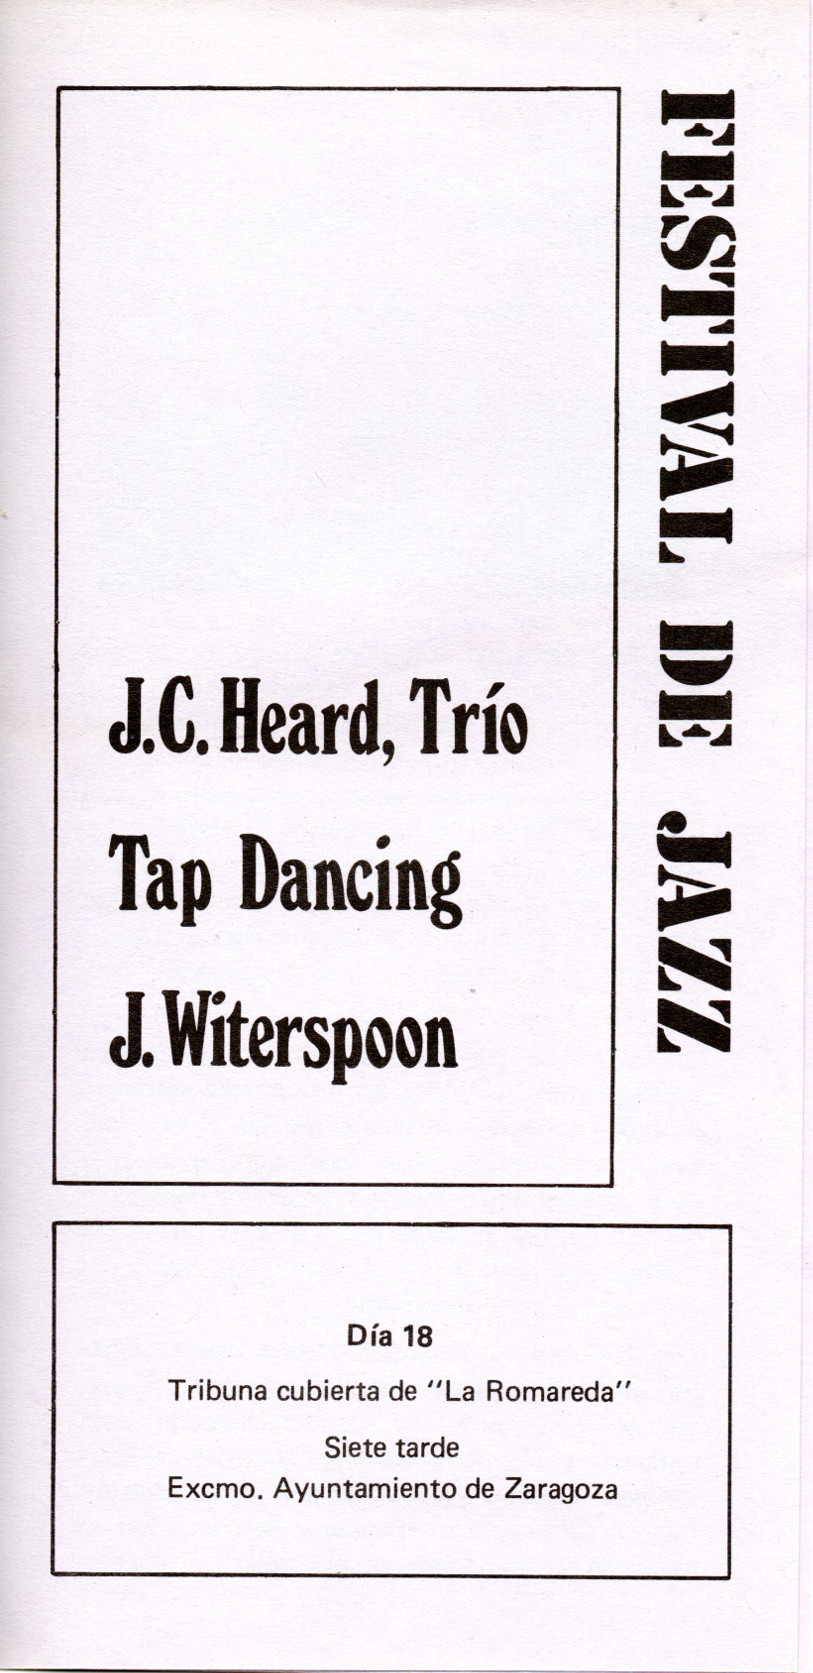 1980 Jazz Pilar Portada Blog